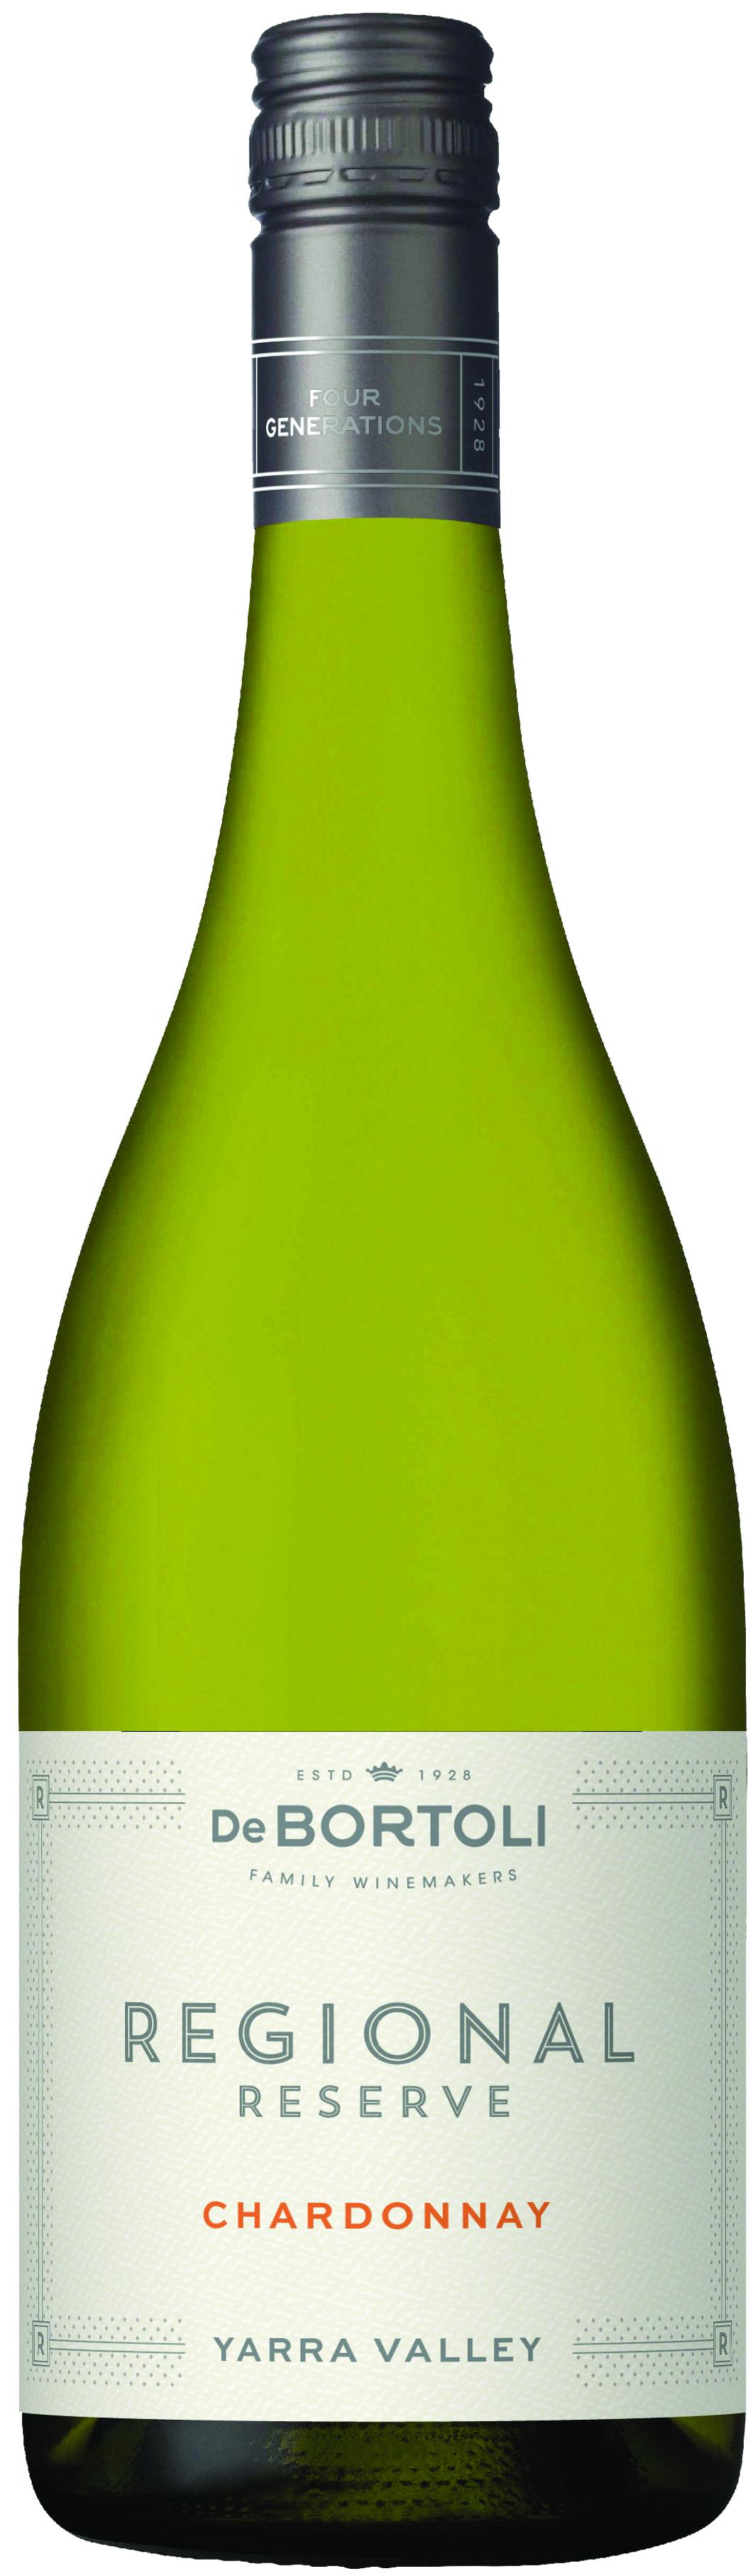 Regional Reserve Chardonnay